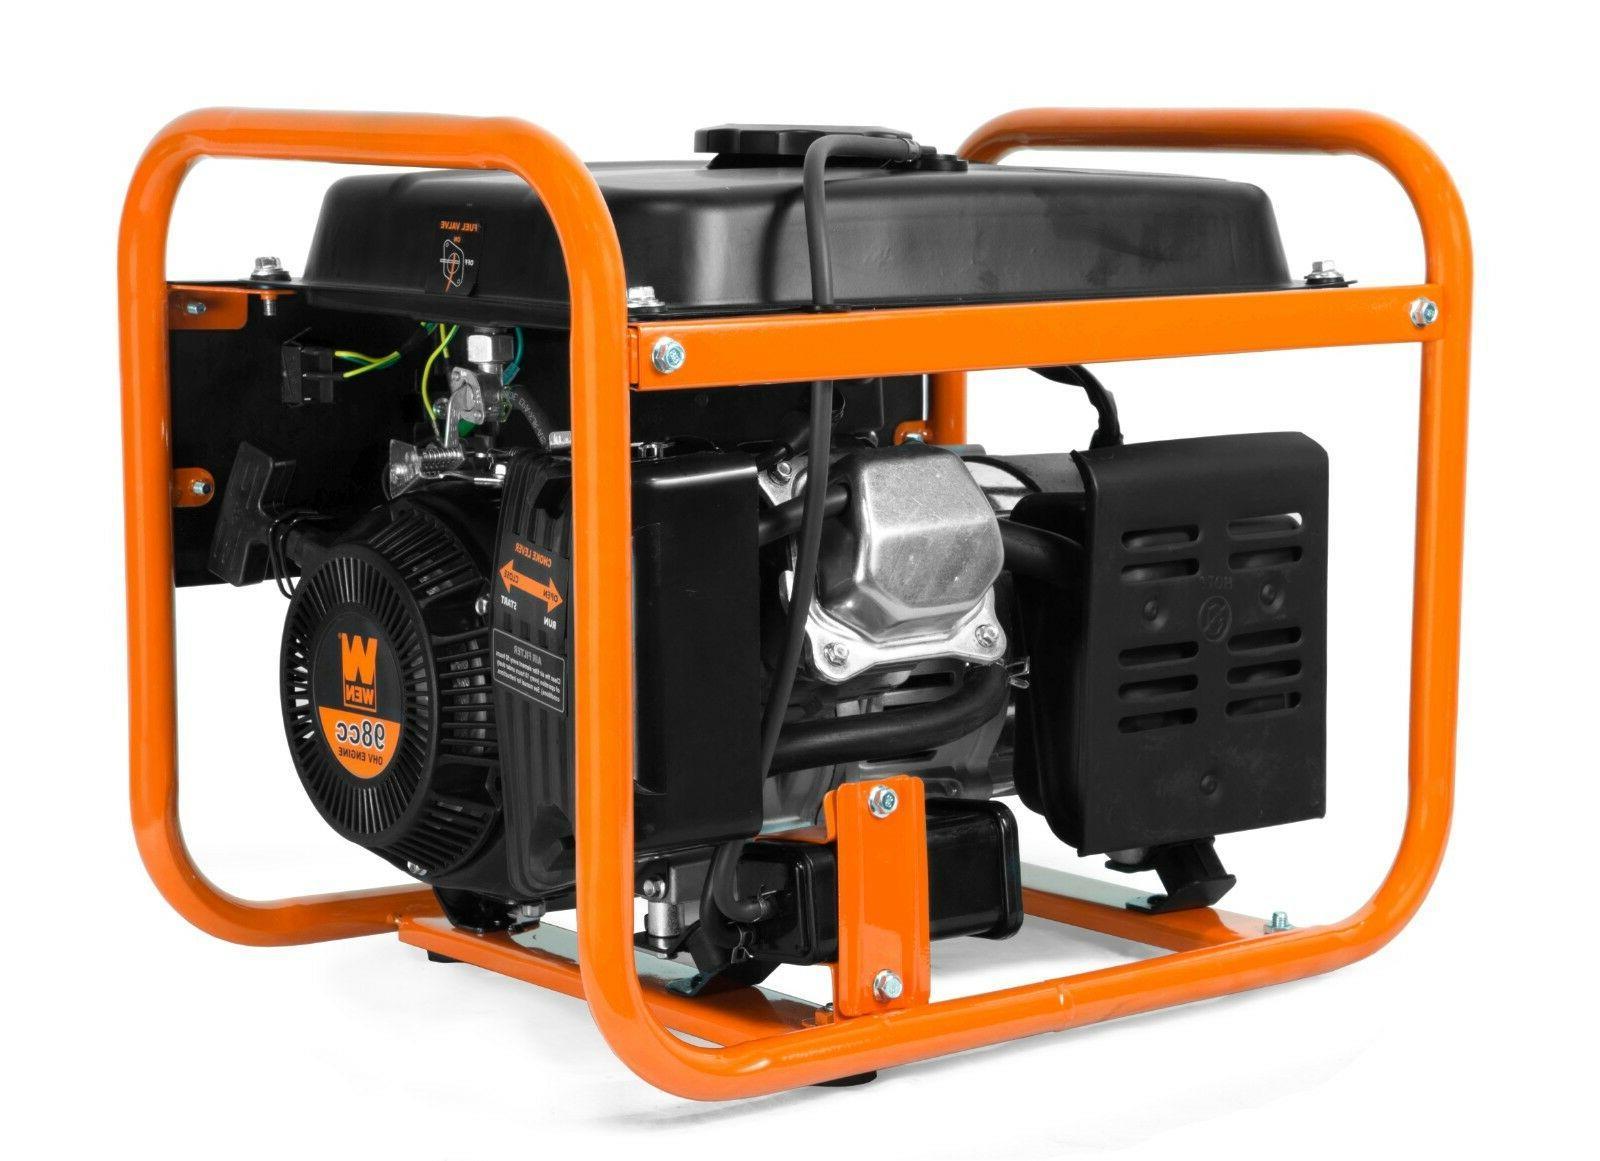 WEN 56155 1550-Watt Portable Generator, CARB